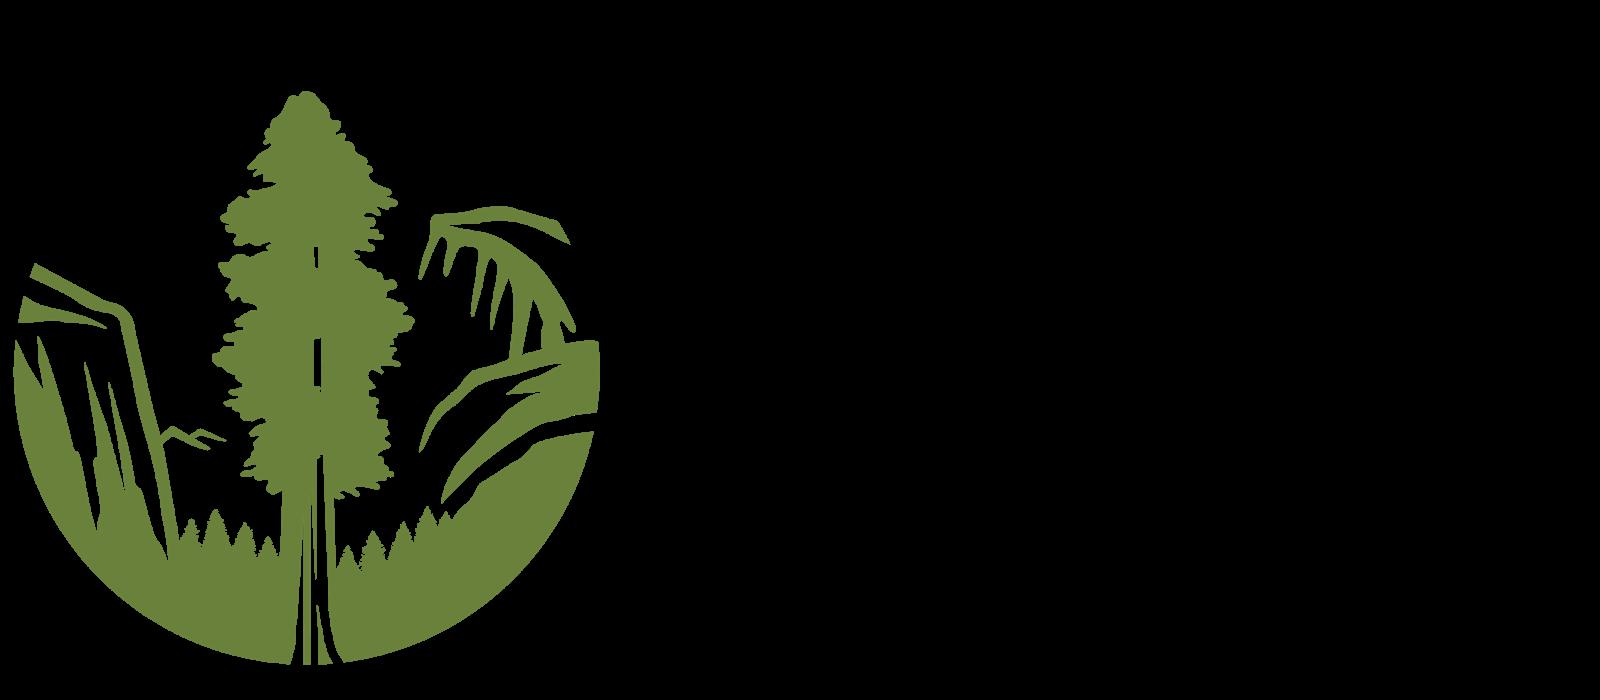 Hunt club turkey logo clipart graphic download Sierra Club Florida News: February 2018 graphic download